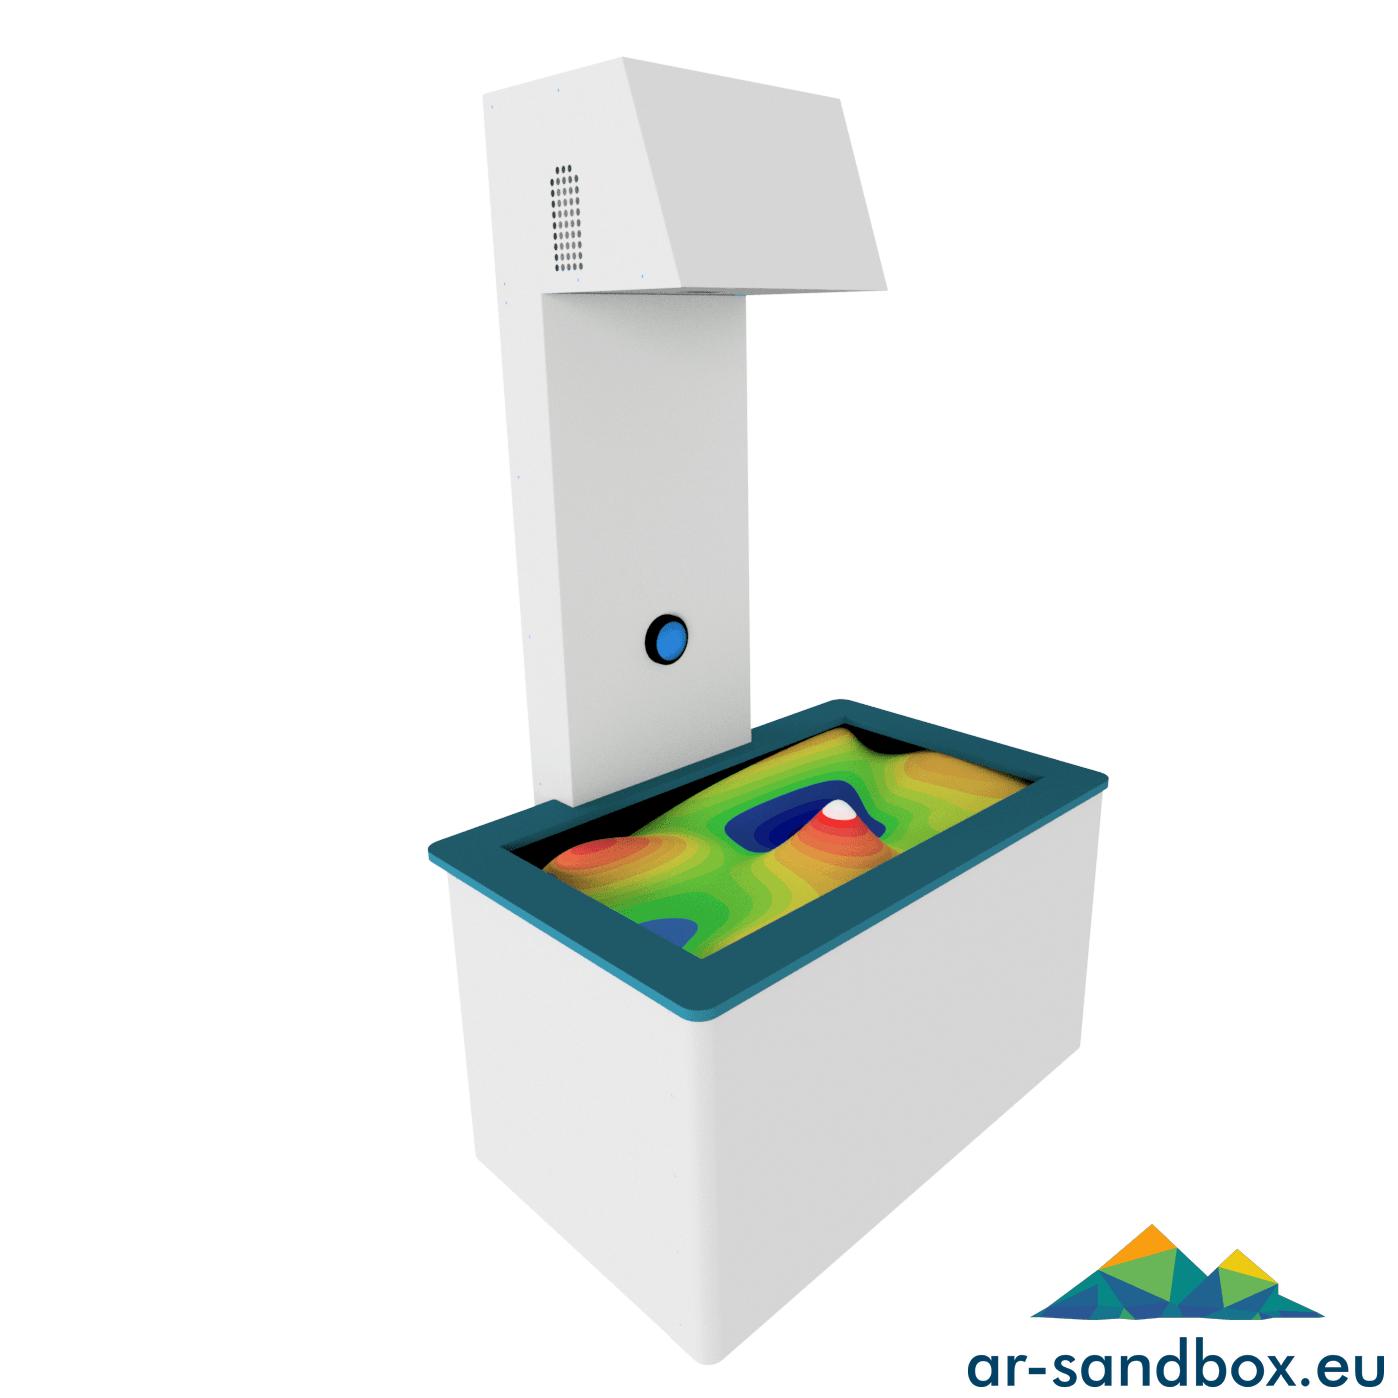 Augmented Reality Sandbox – Standard Model